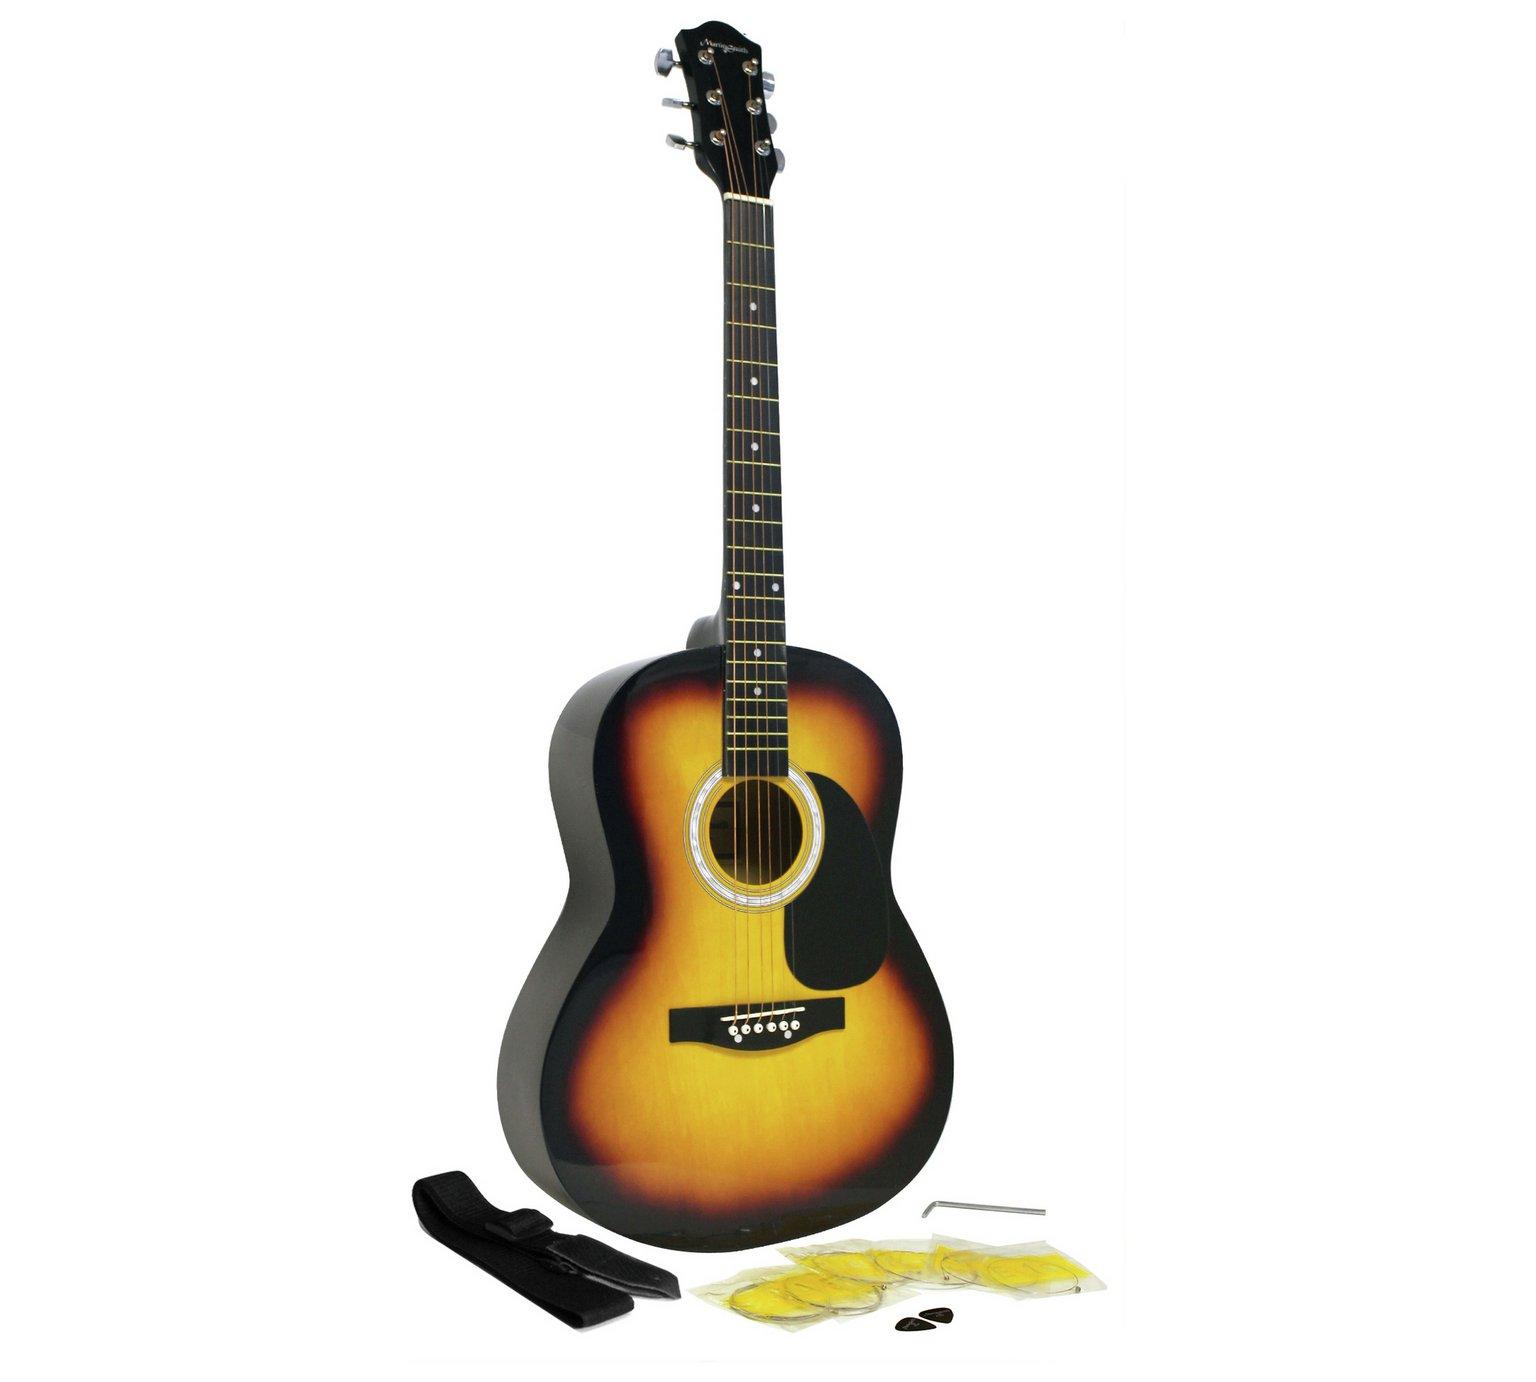 Martin Smith 39 Inch Acoustic Guitar Pack - Sunburst